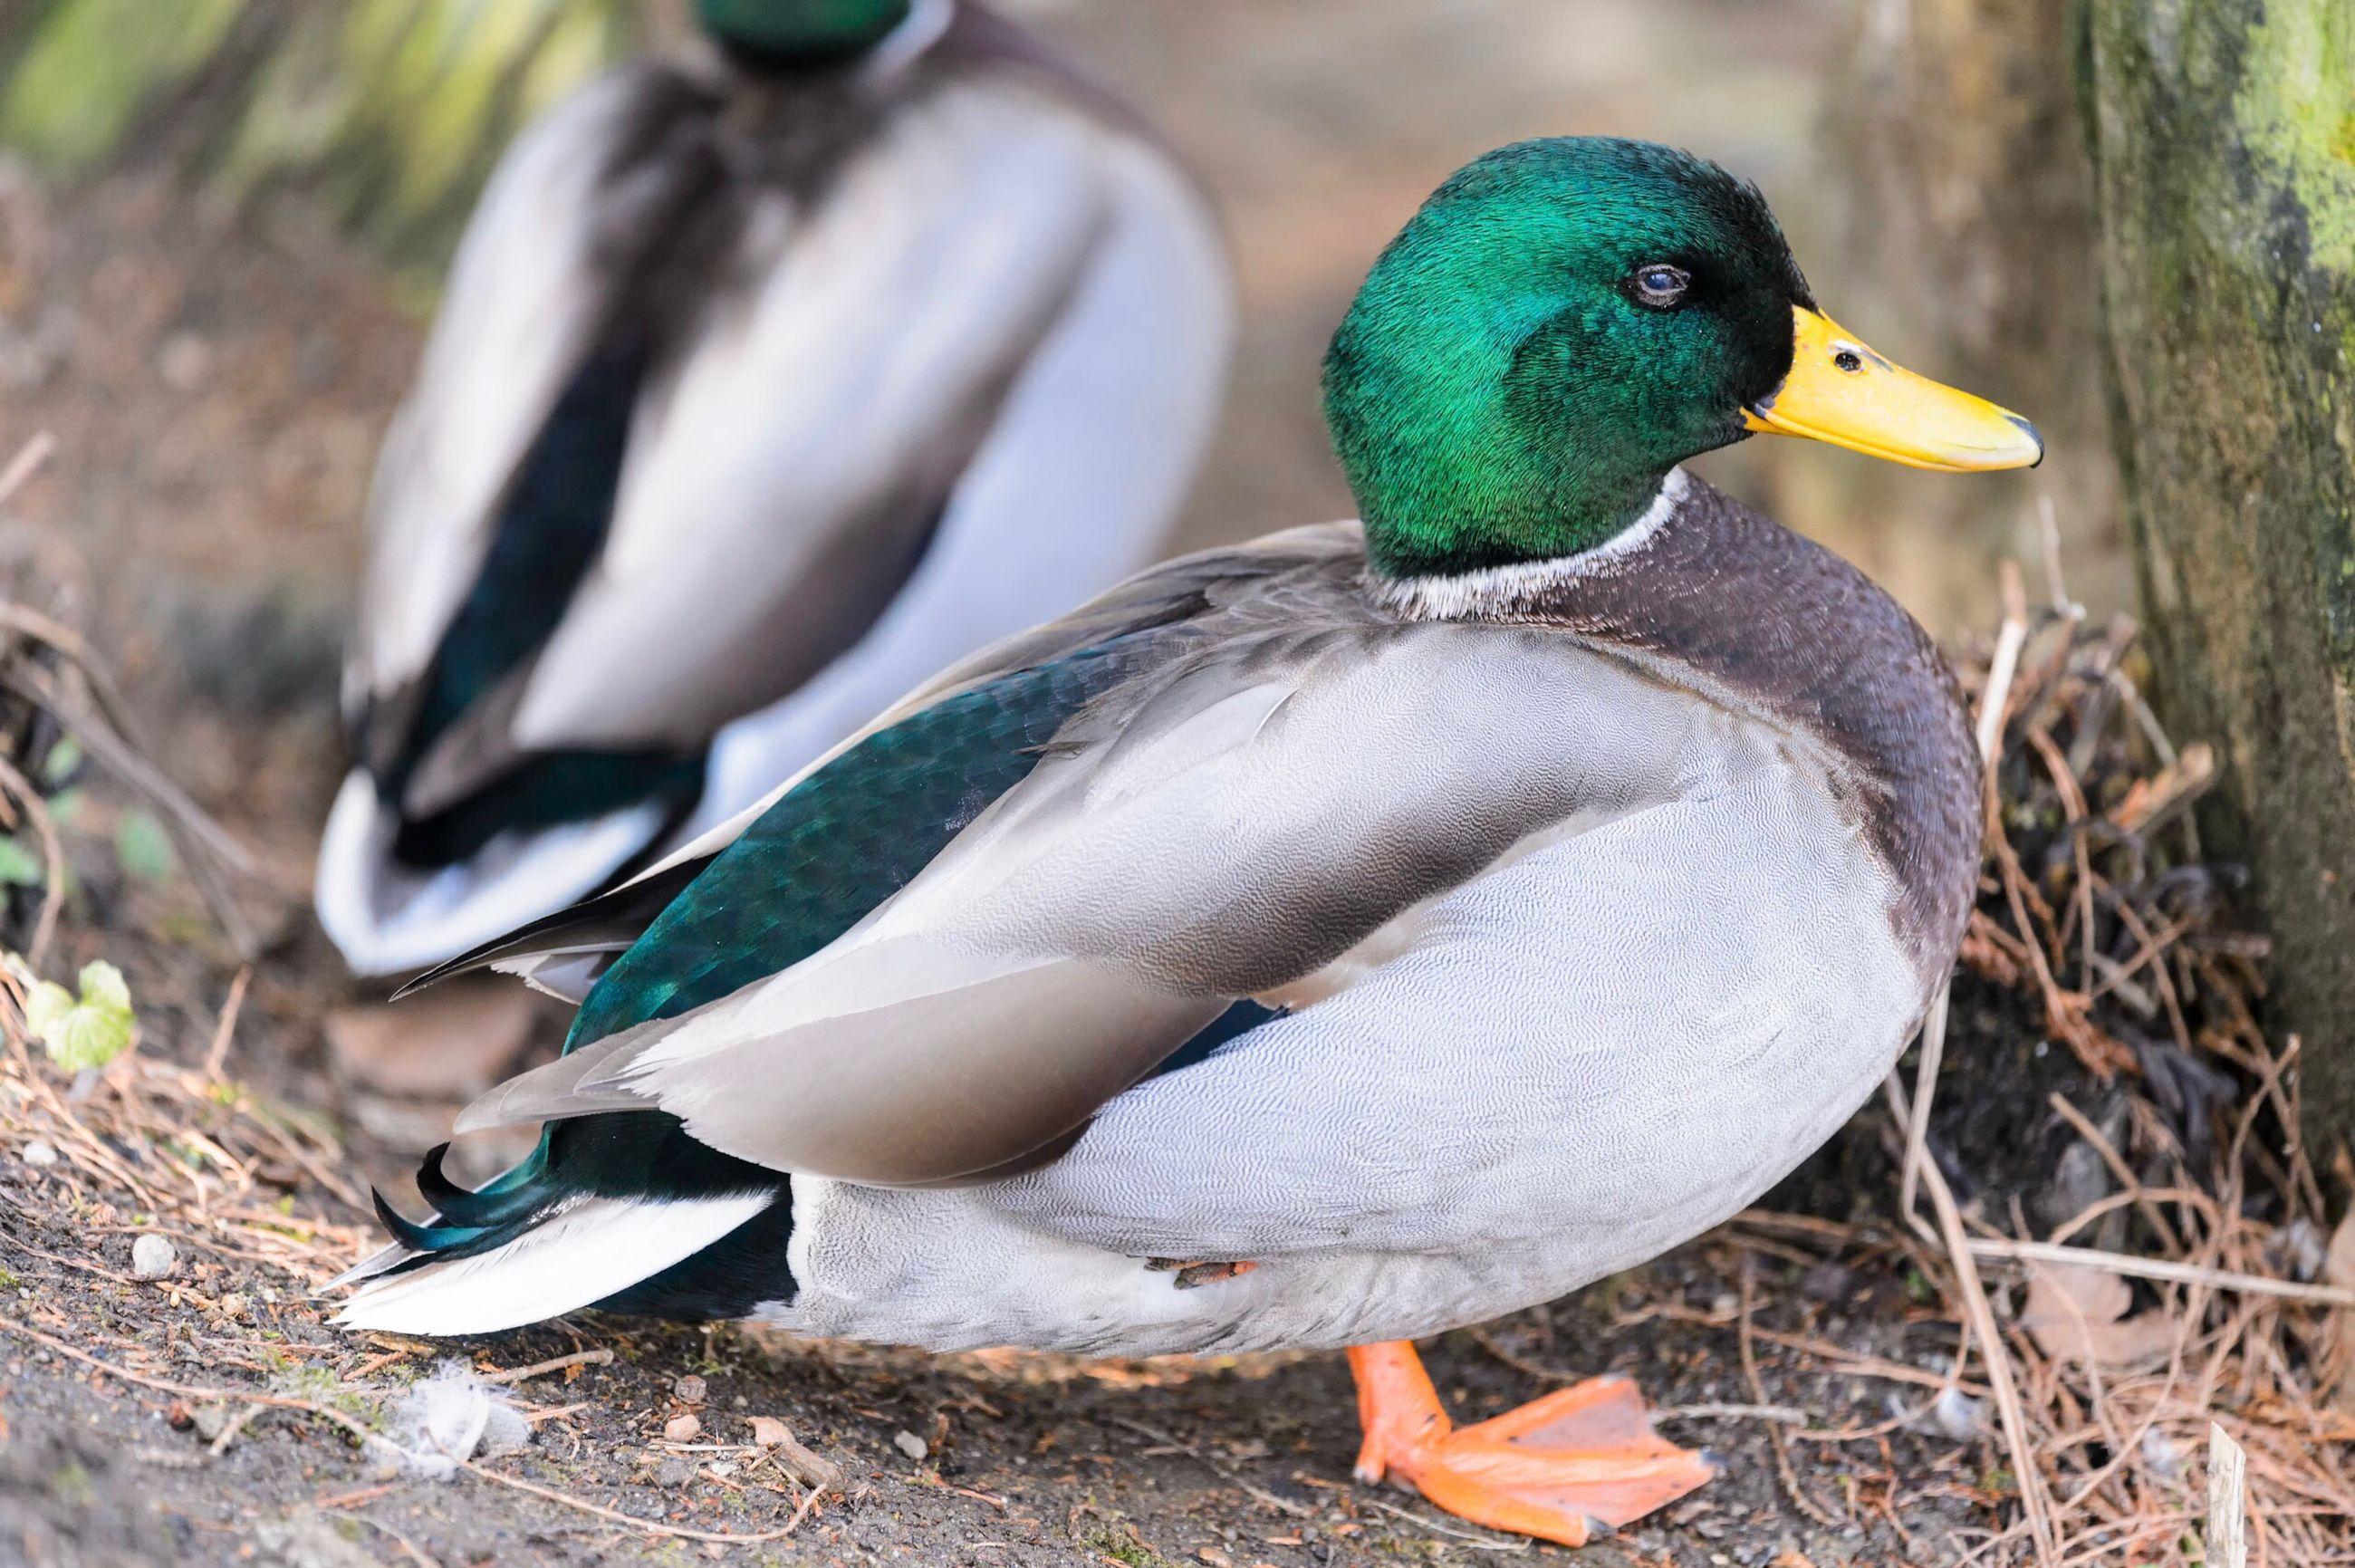 bird, animal themes, duck, female animal, mallard duck, animals in the wild, animal wildlife, close-up, water bird, outdoors, peacock, beak, no people, nature, mandarin duck, day